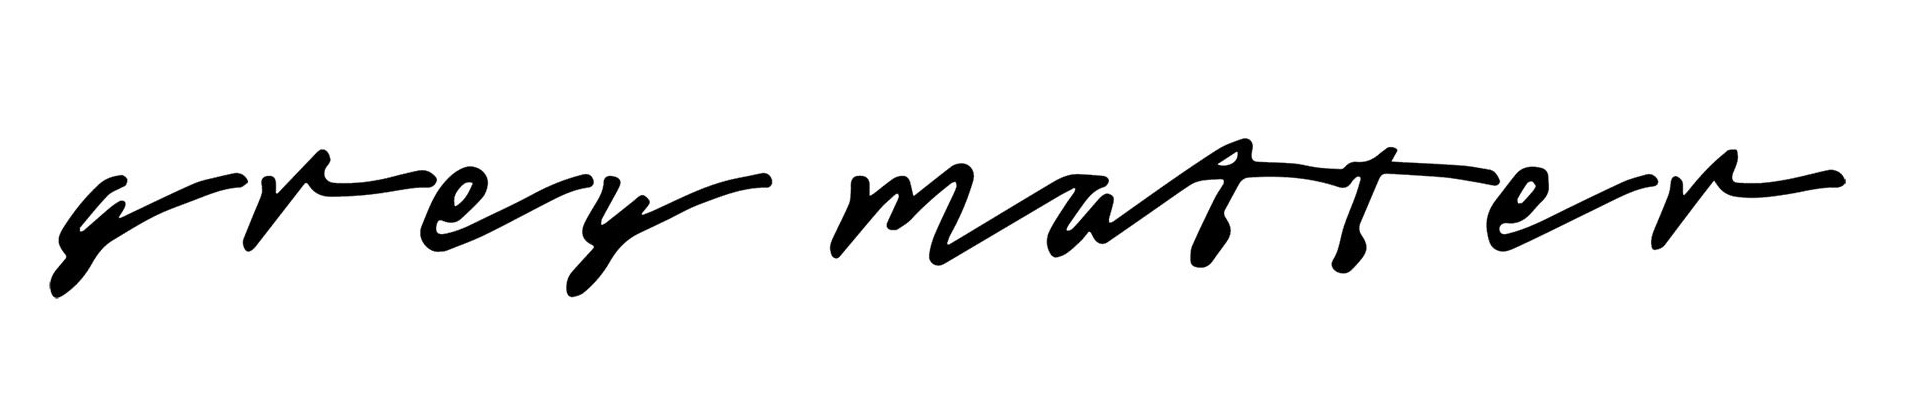 Grey matter logo.jpg